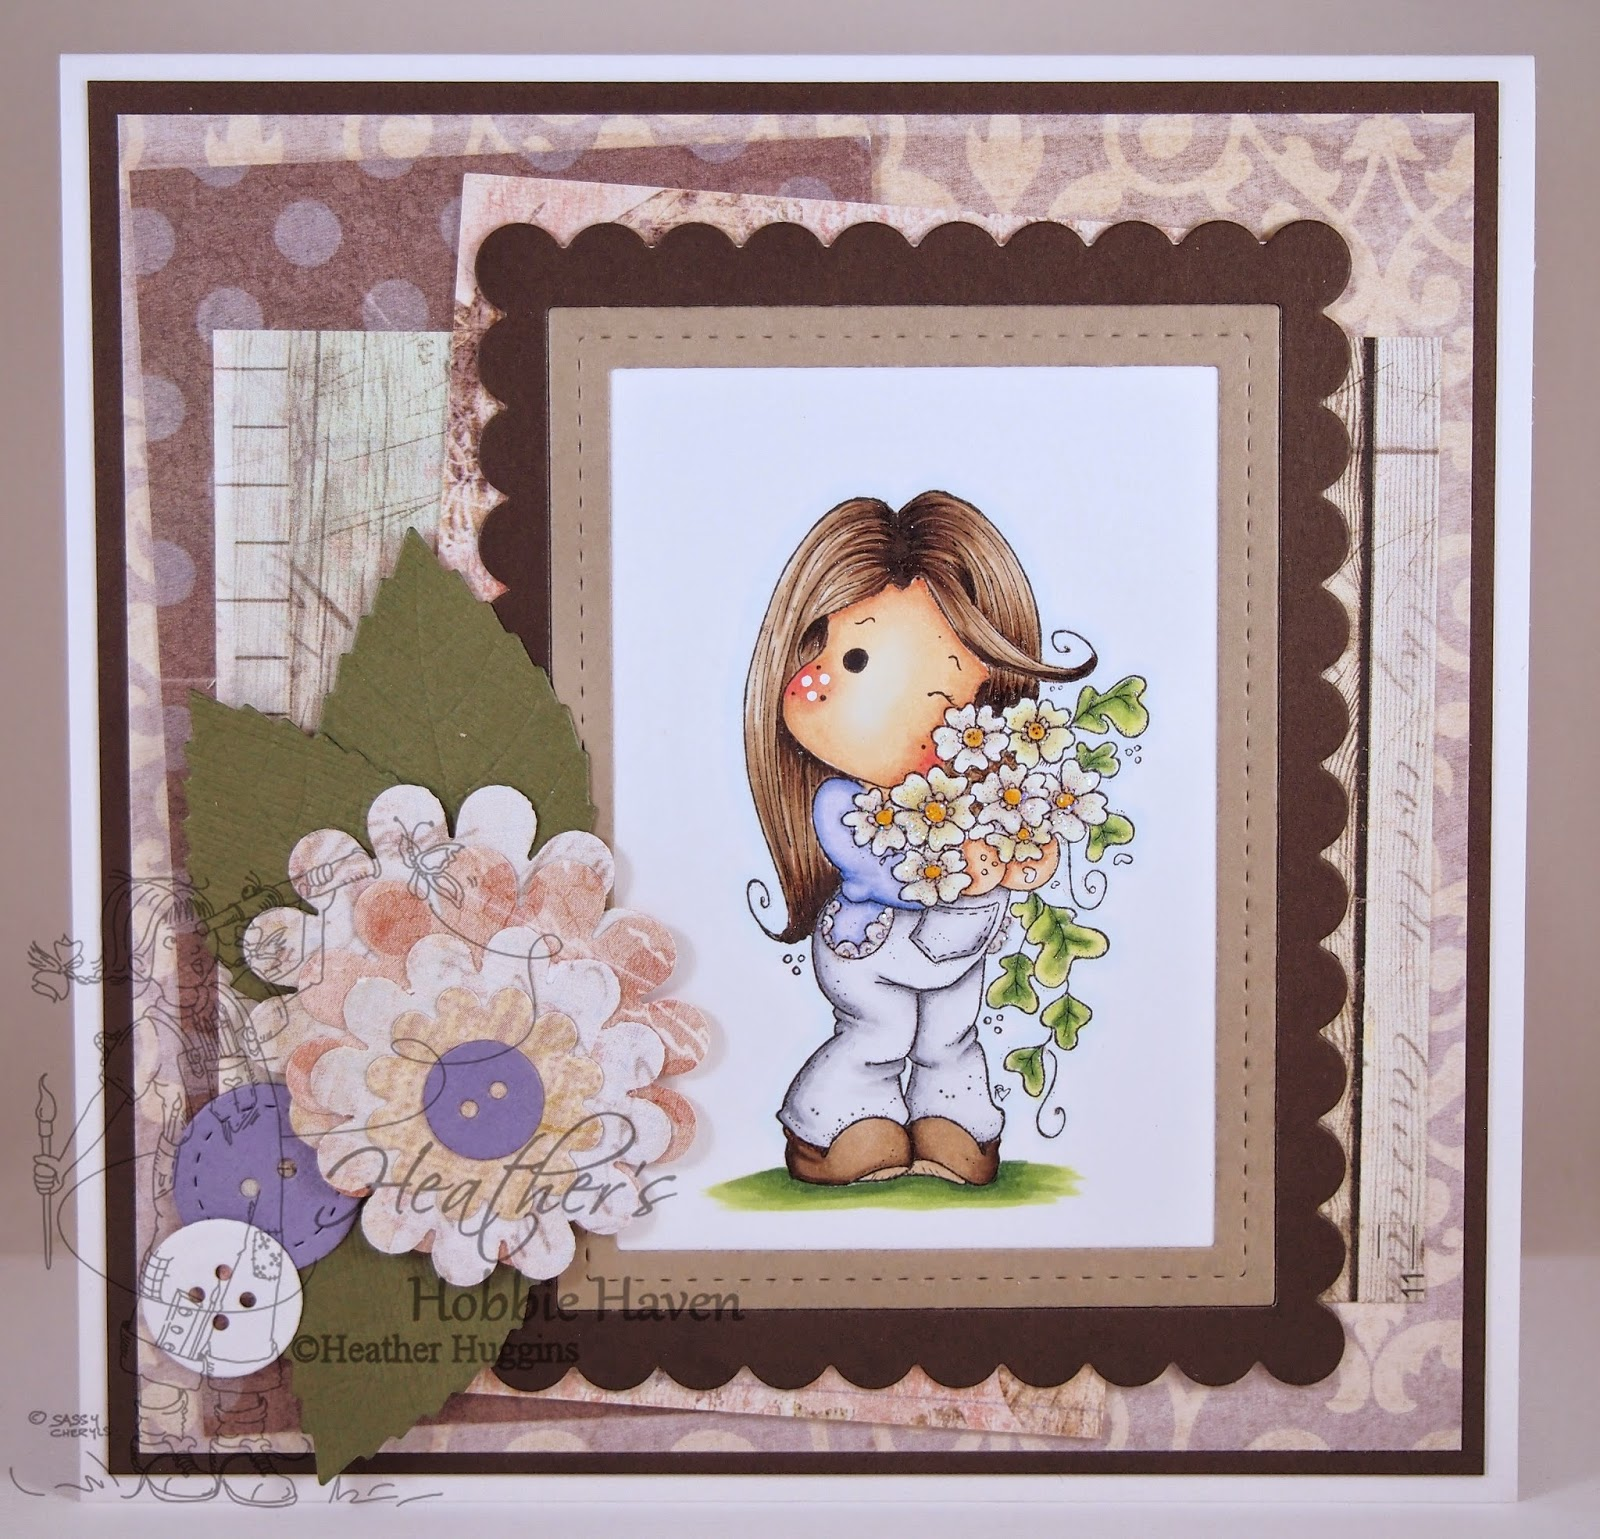 Heather's Hobbie Haven - New Year Sakura Tilda Card Kit